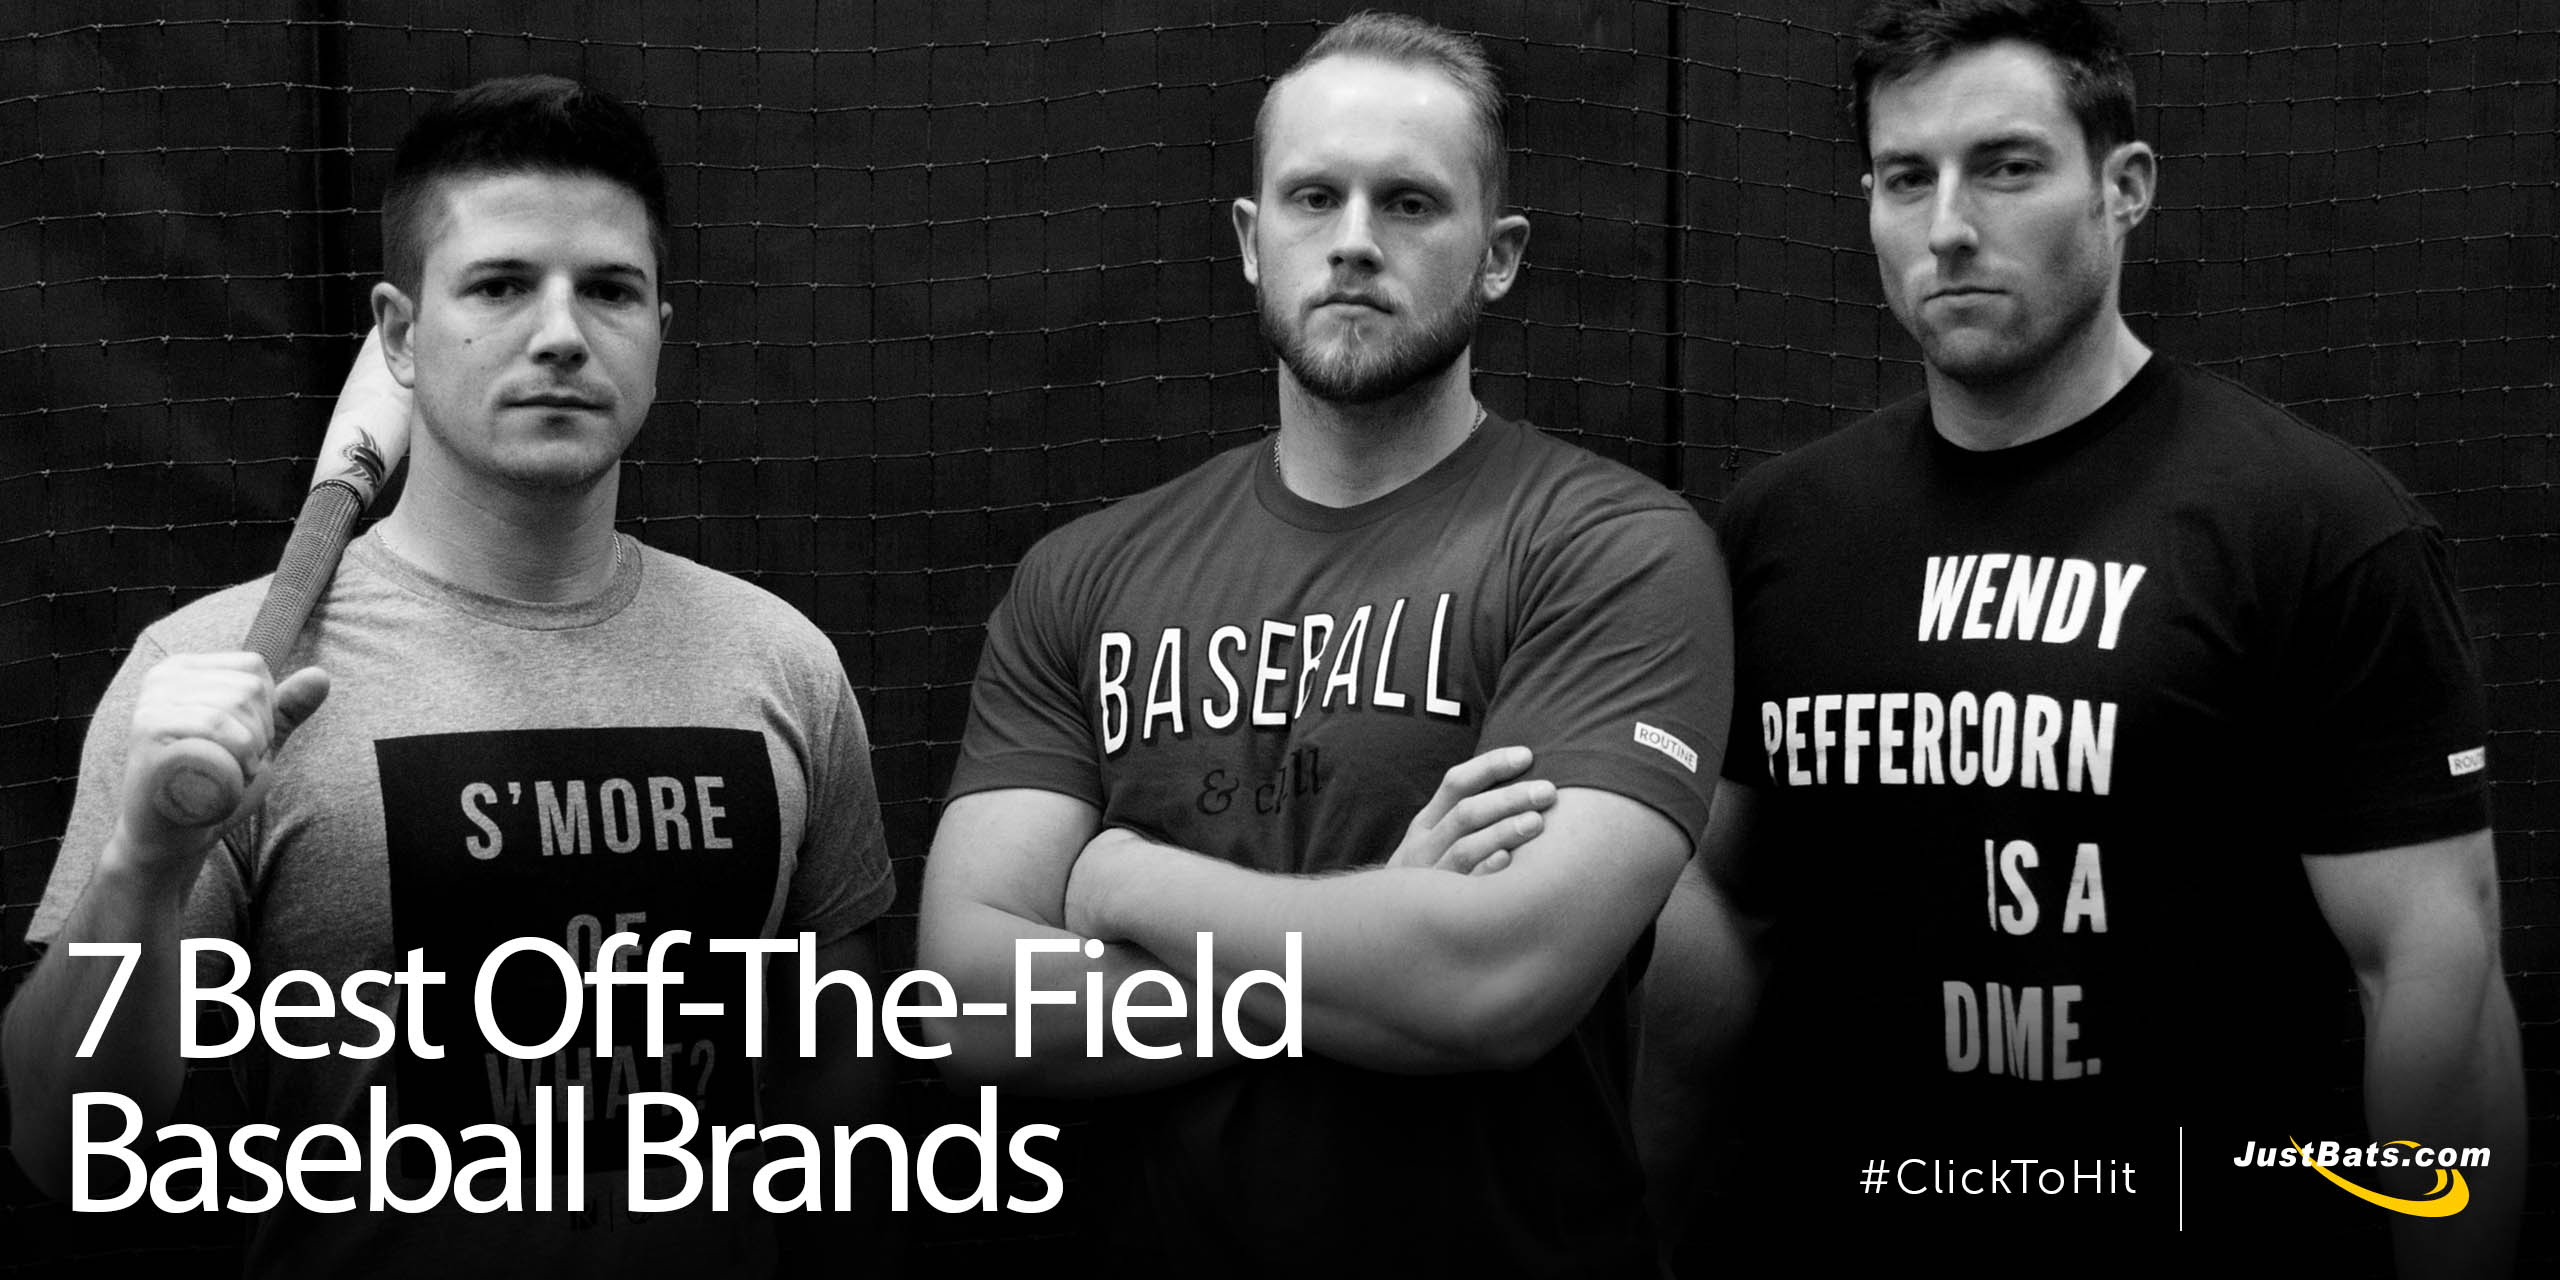 7 Best Off-the-Field Baseball Brands - Blog.jpg